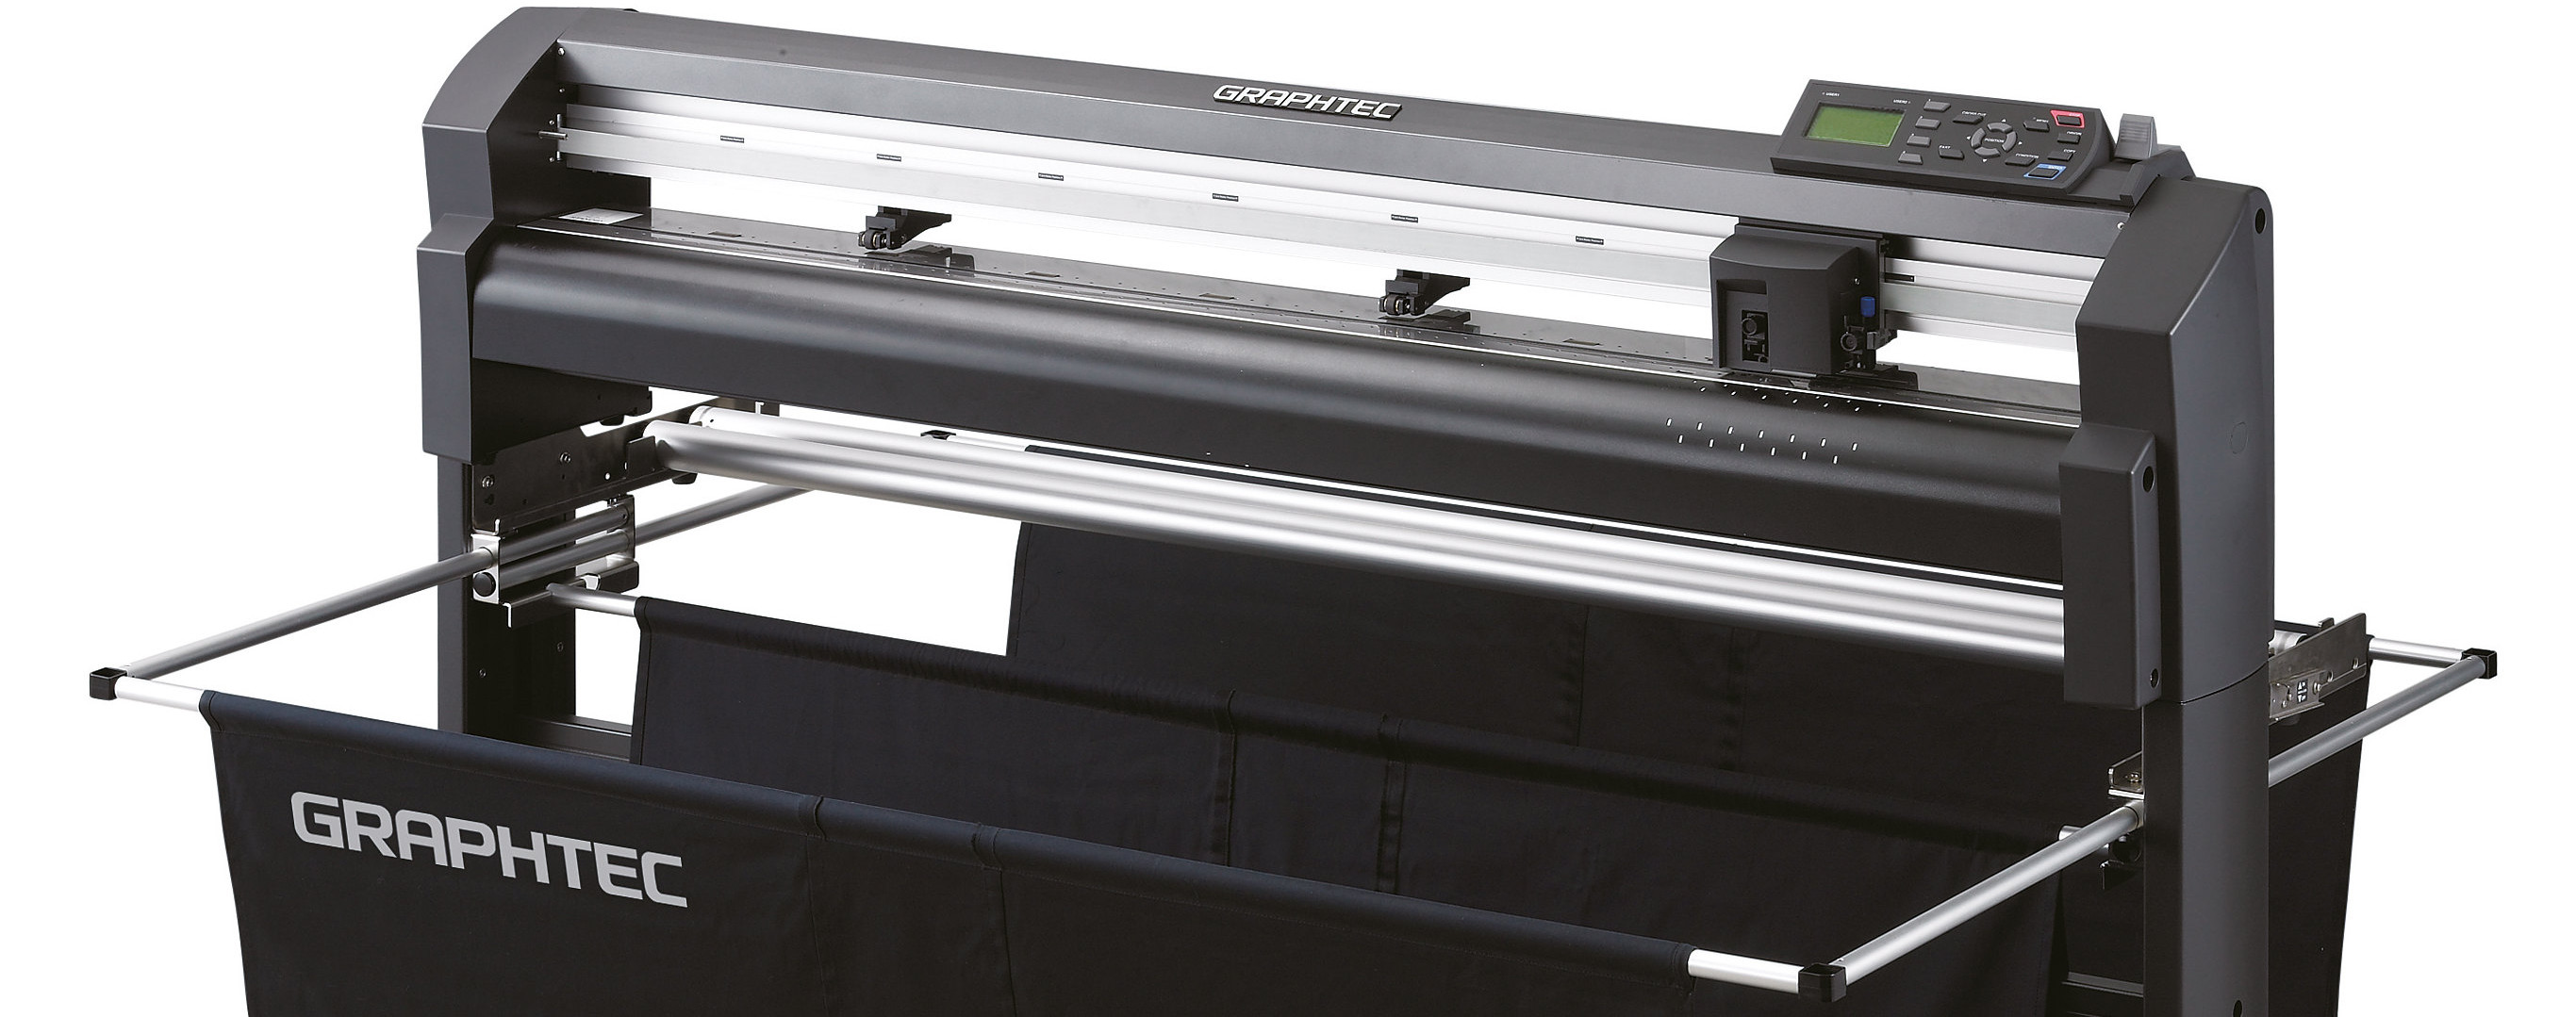 FC8600-100 rolkowy ploter tnący